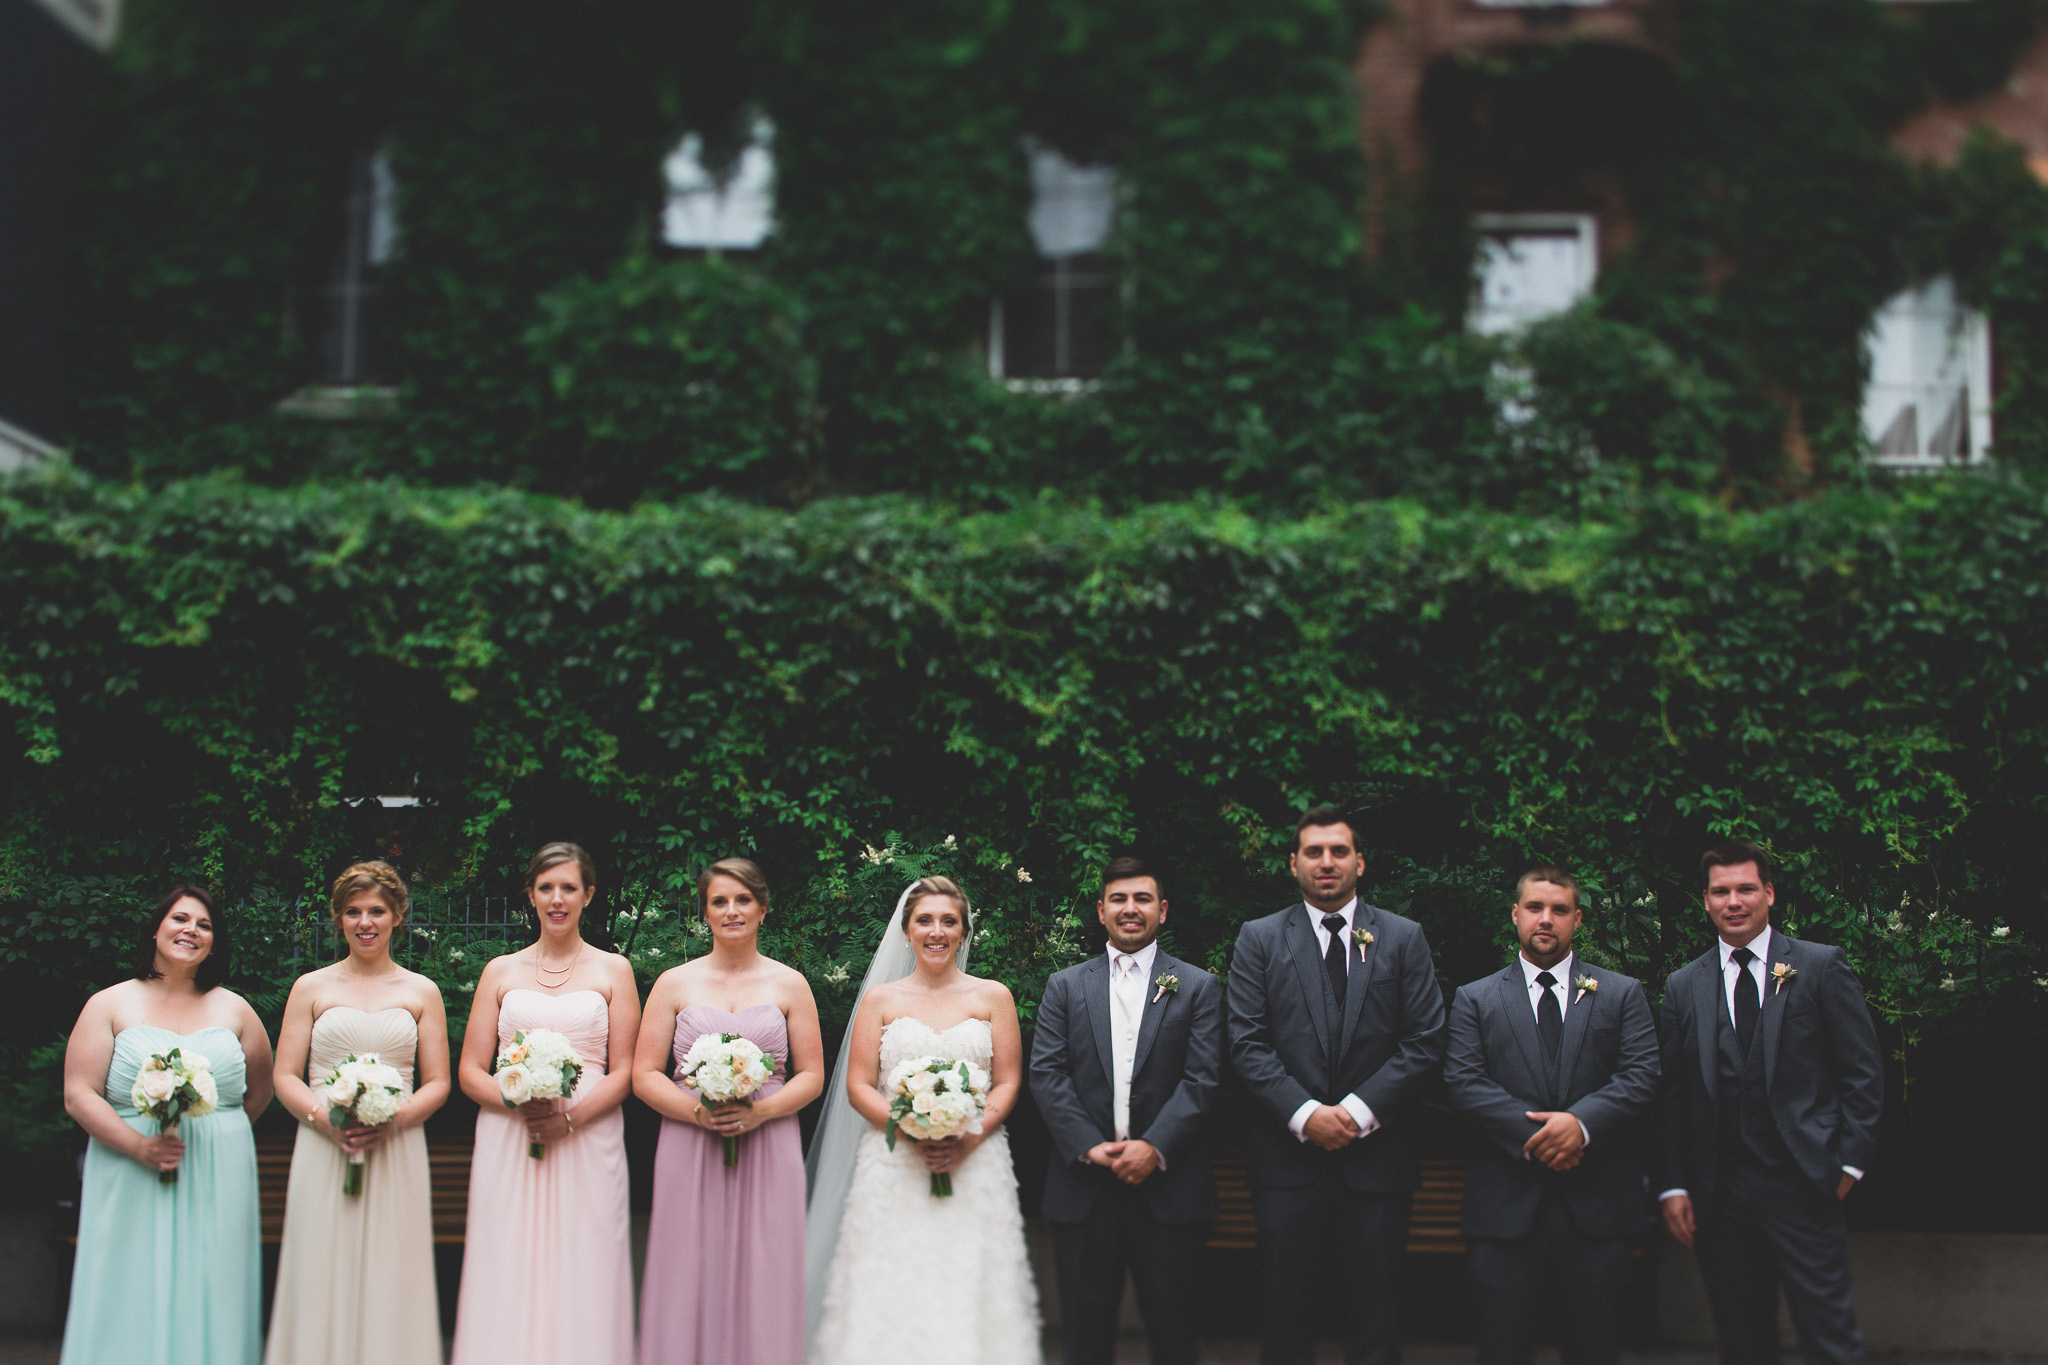 courtyard in ottawa wedding portrait